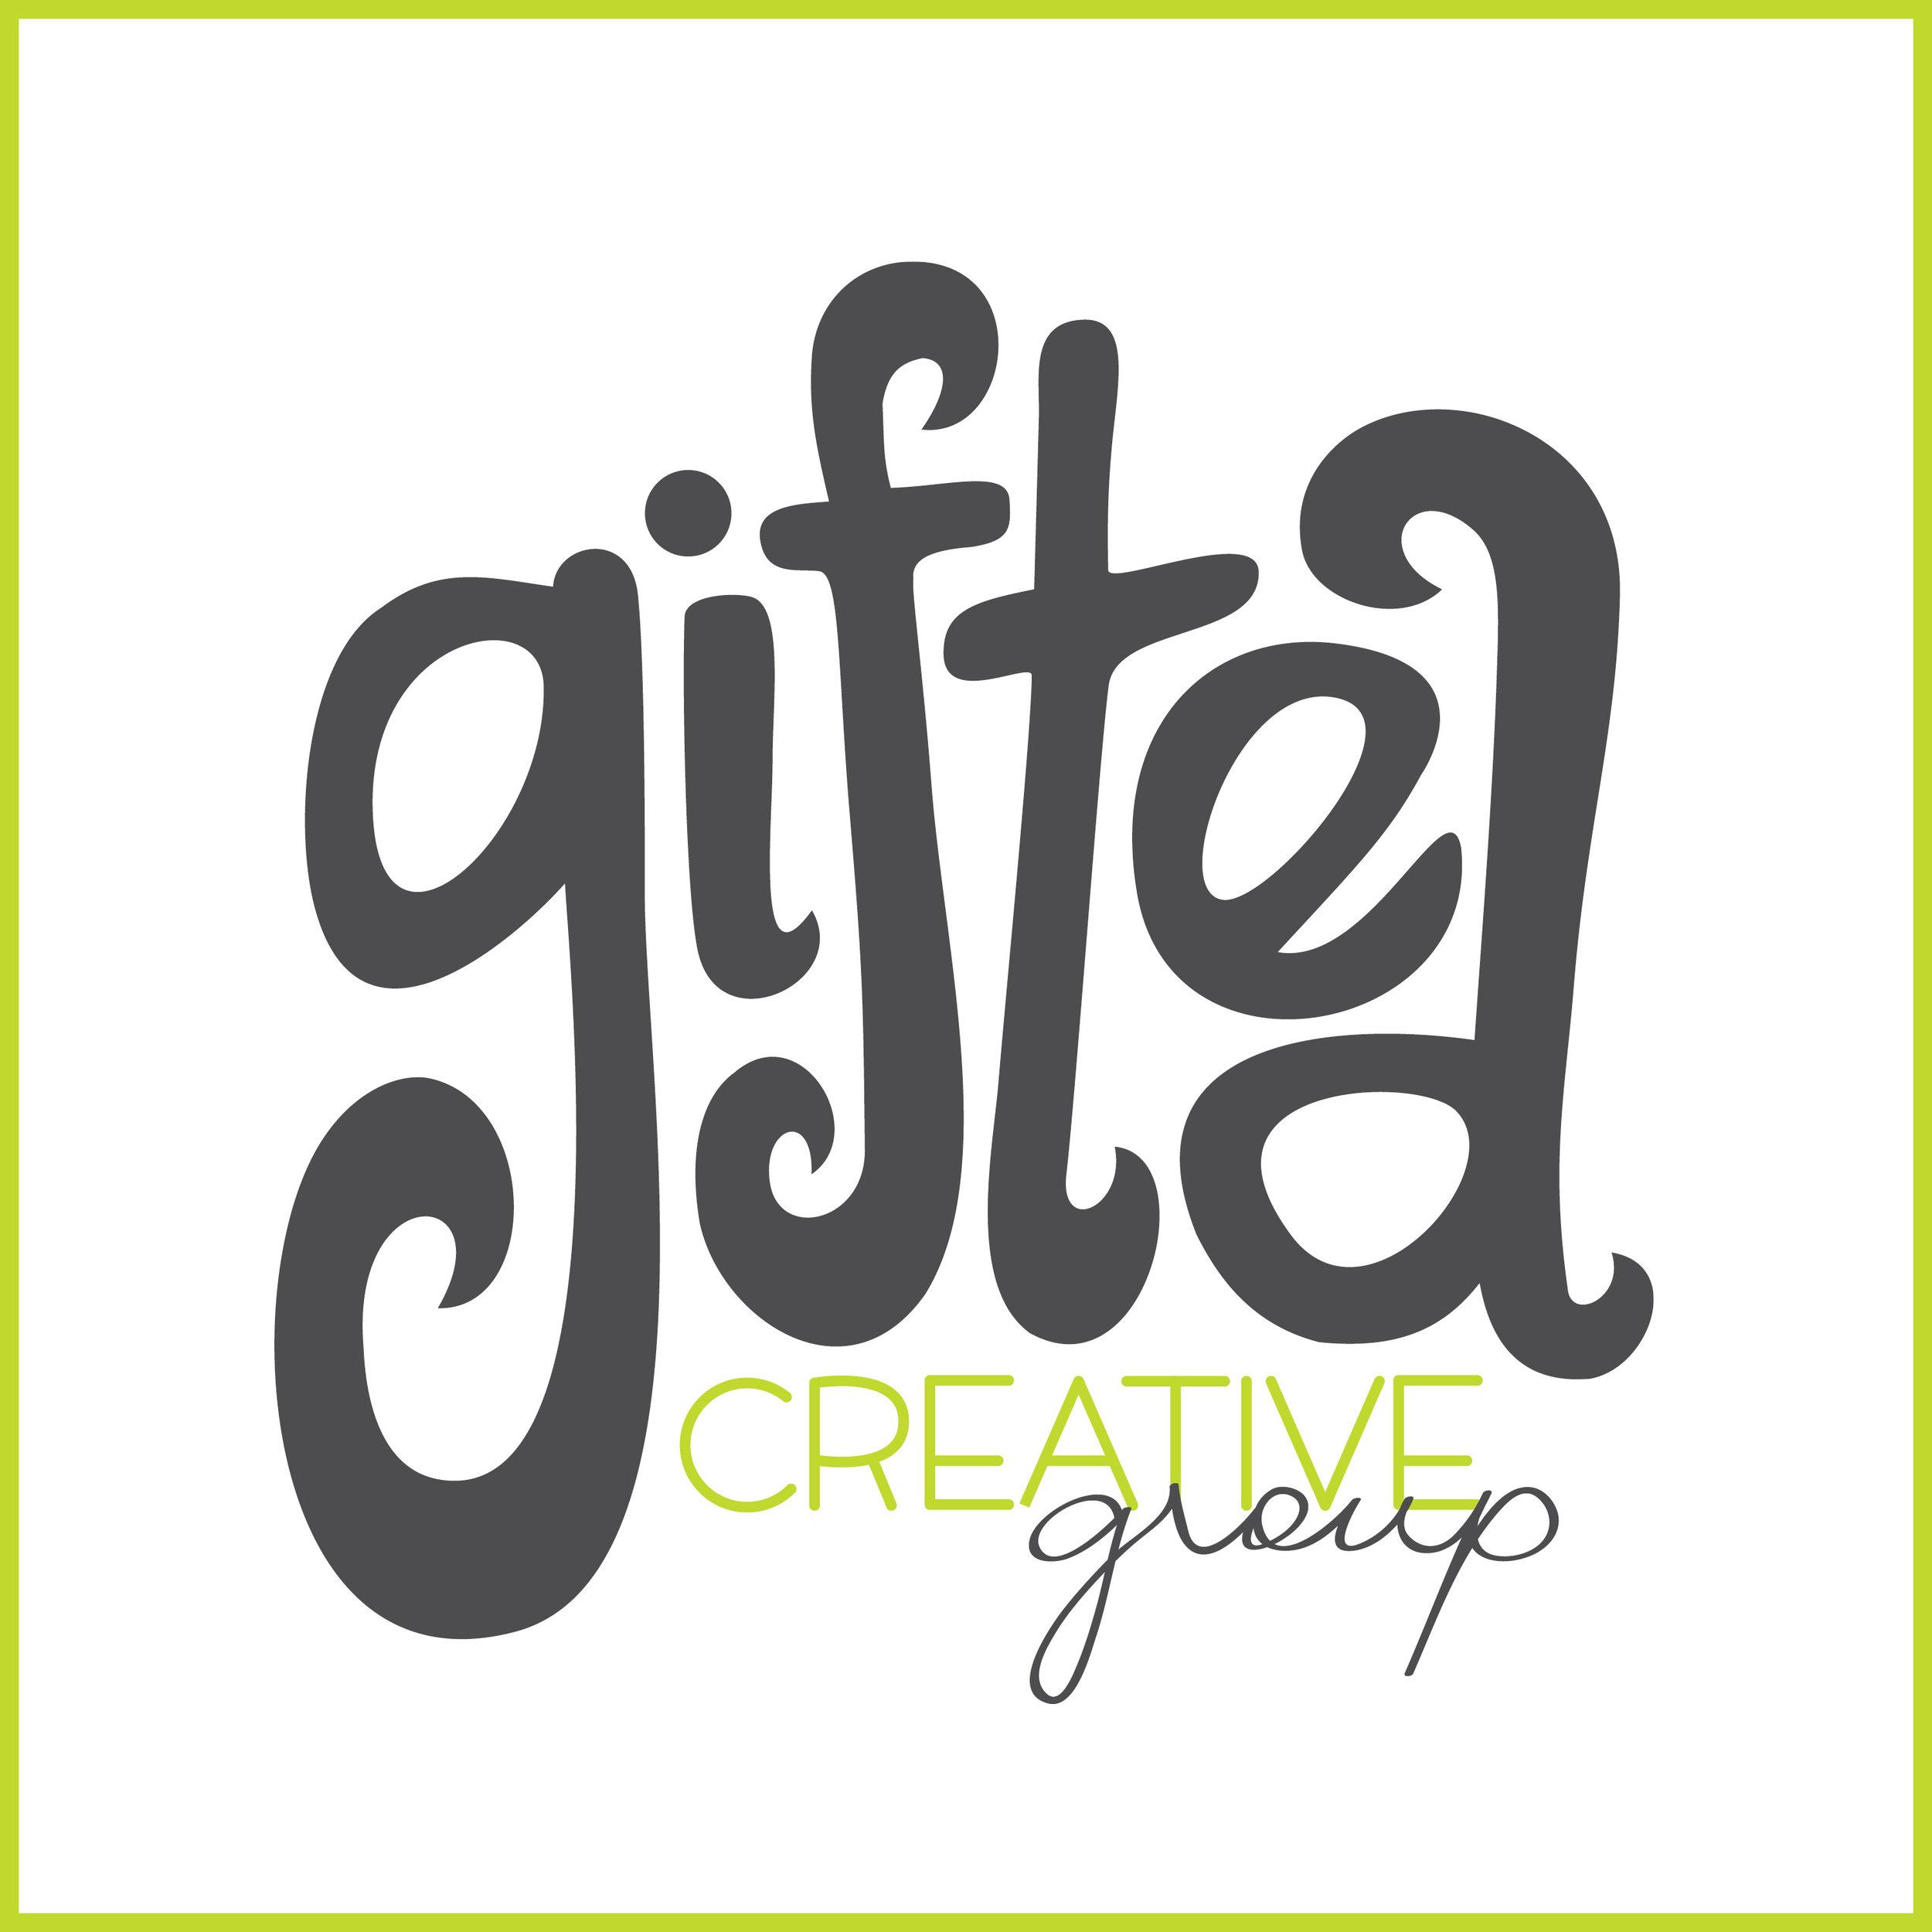 Gifted Creative Group  (412) 407-7541  hello@giftedcreative.com  giftedcreative@gmail.com   GiftedCreative.com   fb.com/GiftedCreative   instagram.com/GiftedCreative   twitter.com/GiftedCreative